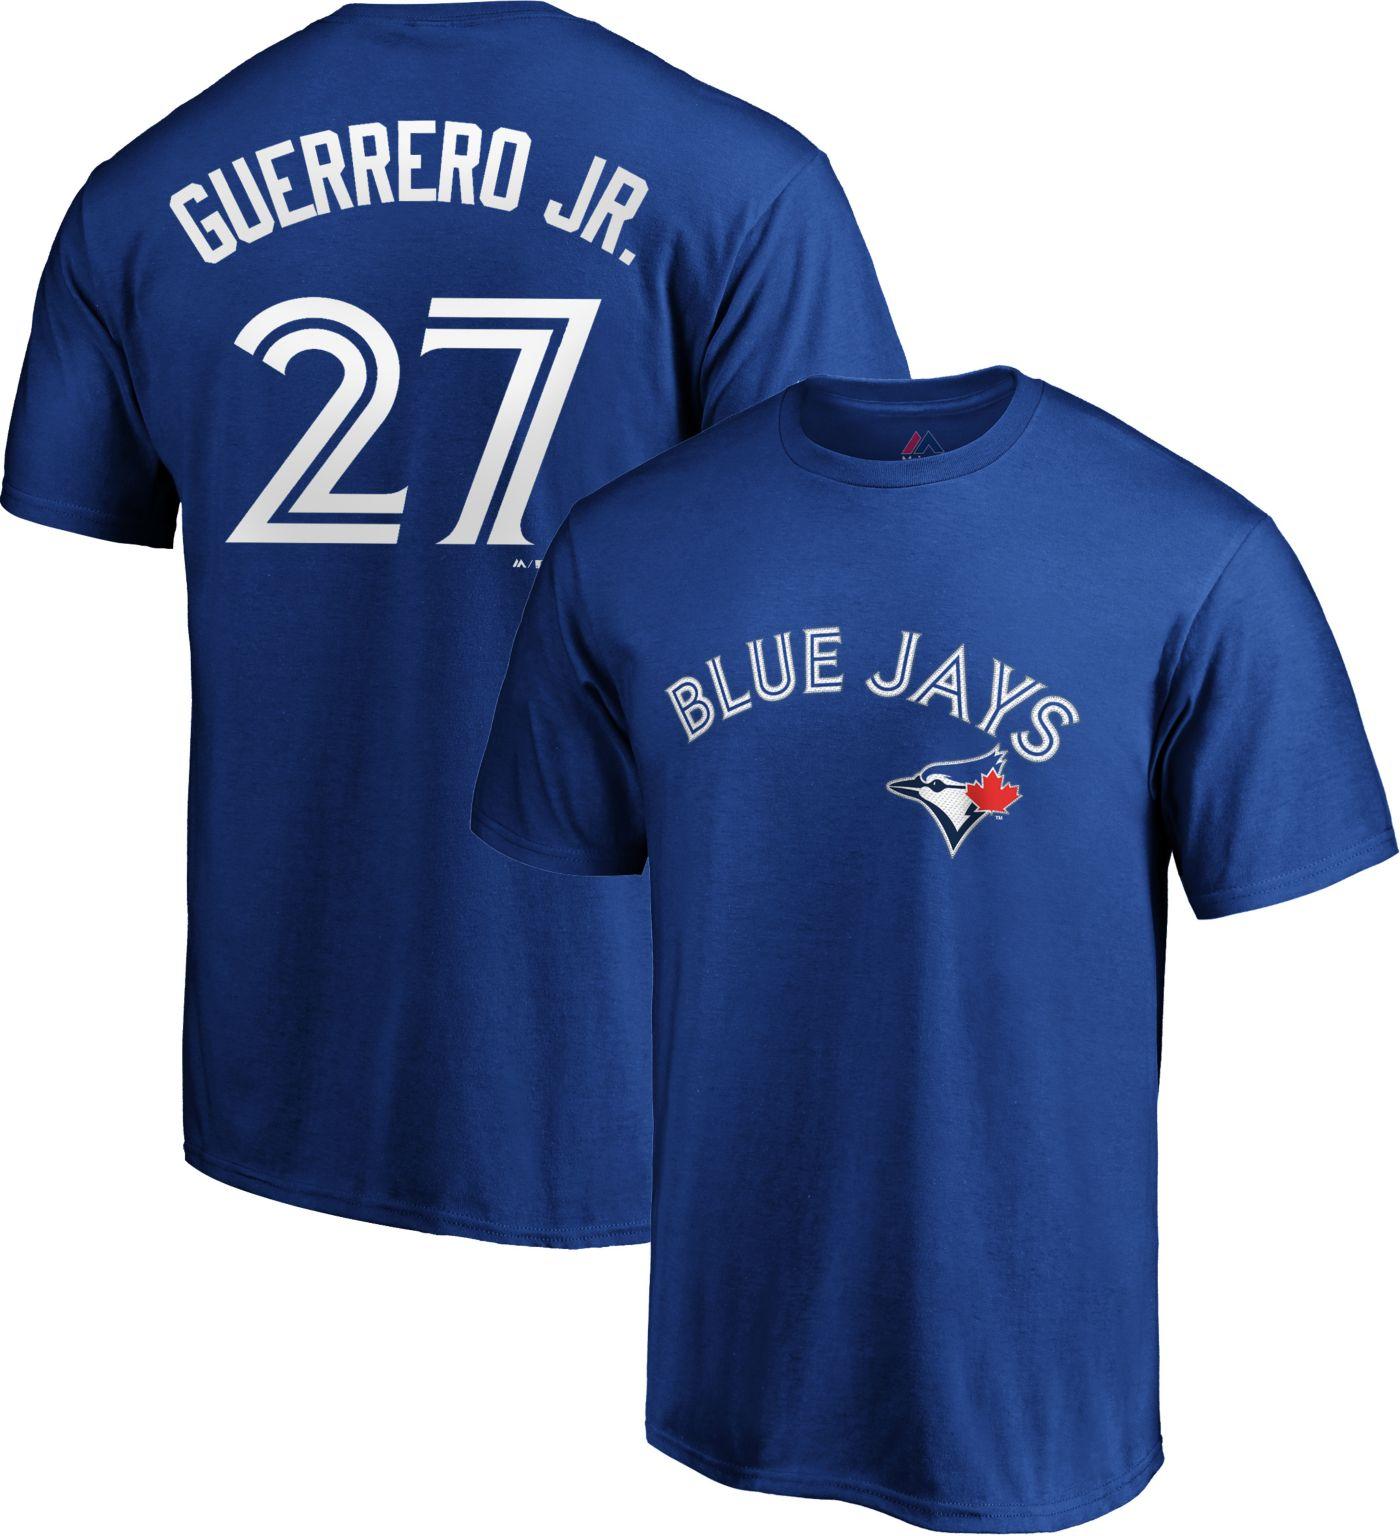 Majestic Men's Toronto Blue Jays Vladimir Guerrero Jr. #27 Royal T-Shirt